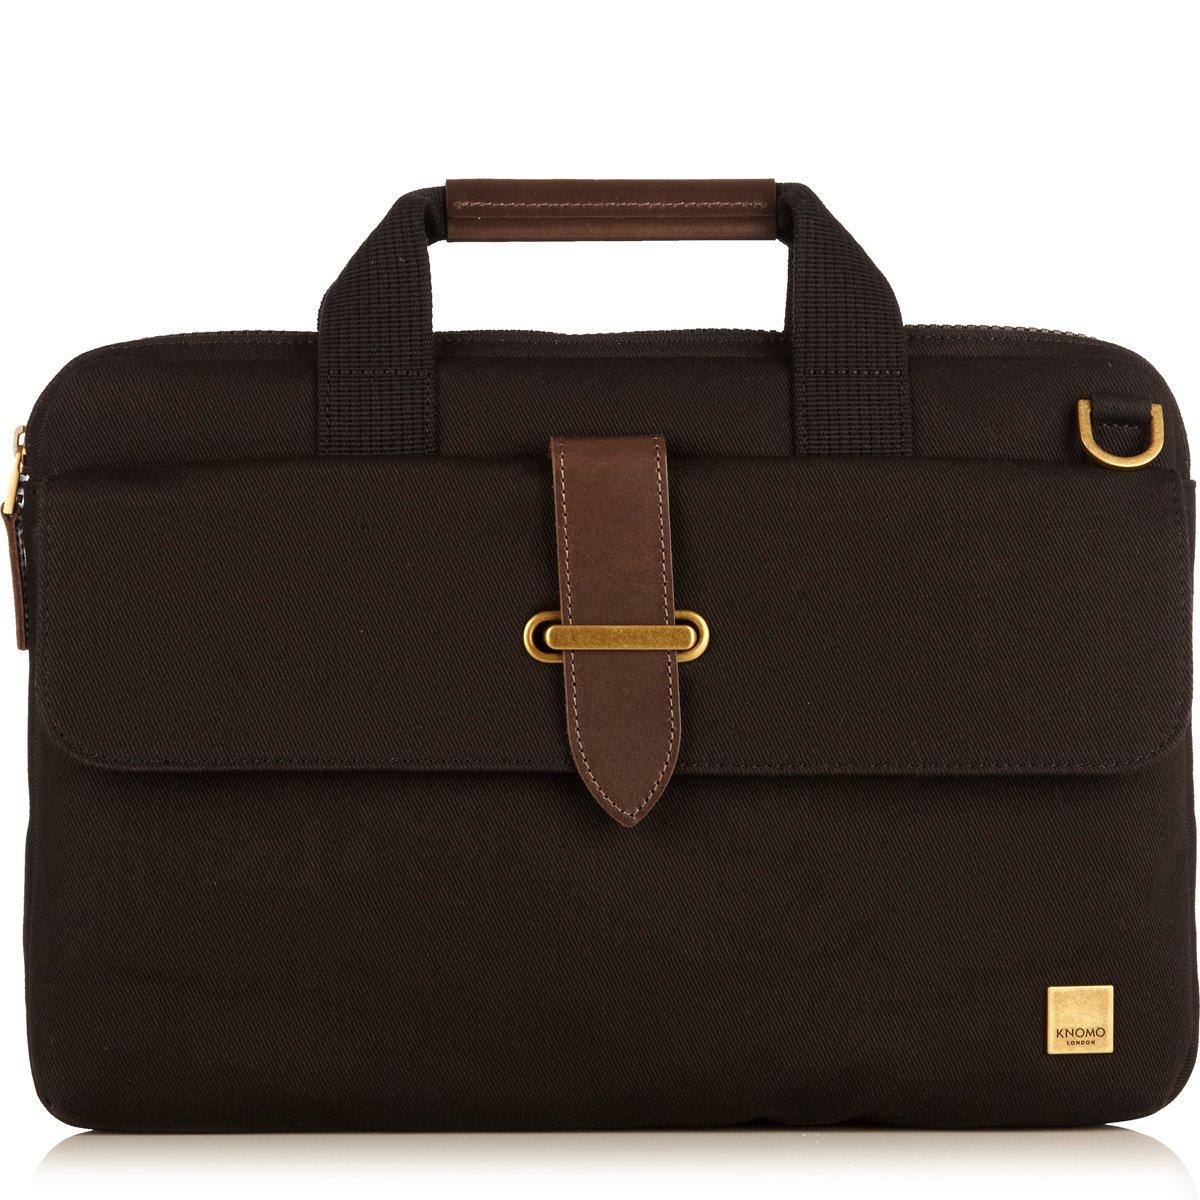 Knomo Balham Par 15-Inch Cotton Canvas Slim Briefcase, Black